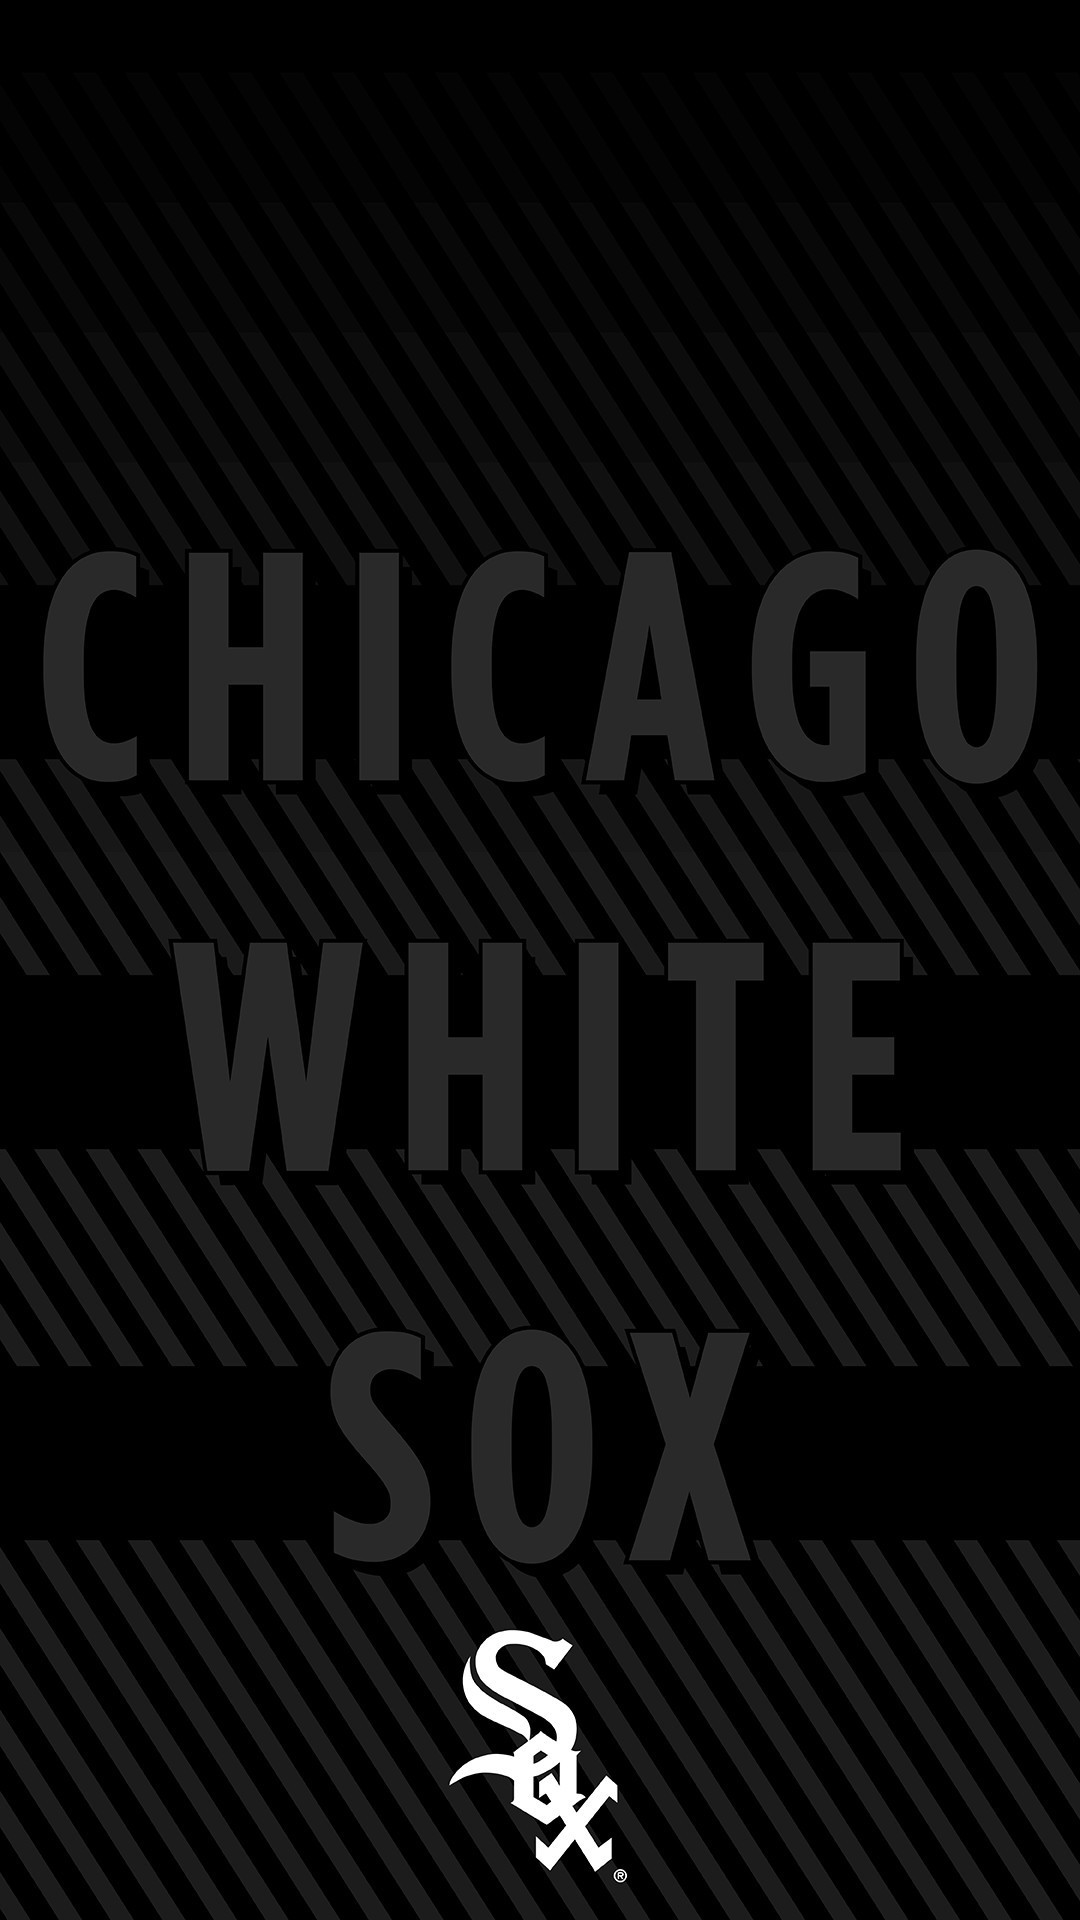 Chicago White Sox Logo Wallpaper 69 images 1080x1920